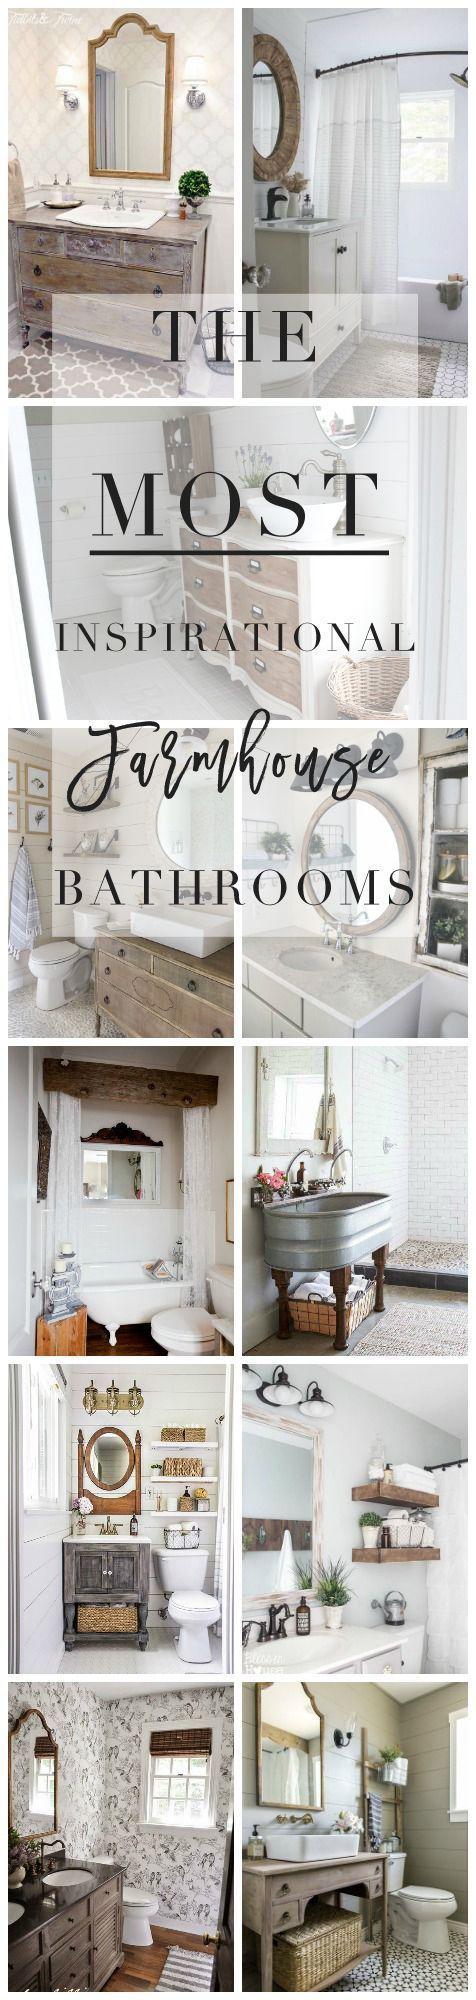 Best 25 Decorating Bathrooms Ideas On Pinterest Restroom Ideas Guest Bathroom Decorating And Bathroom Counter Organization